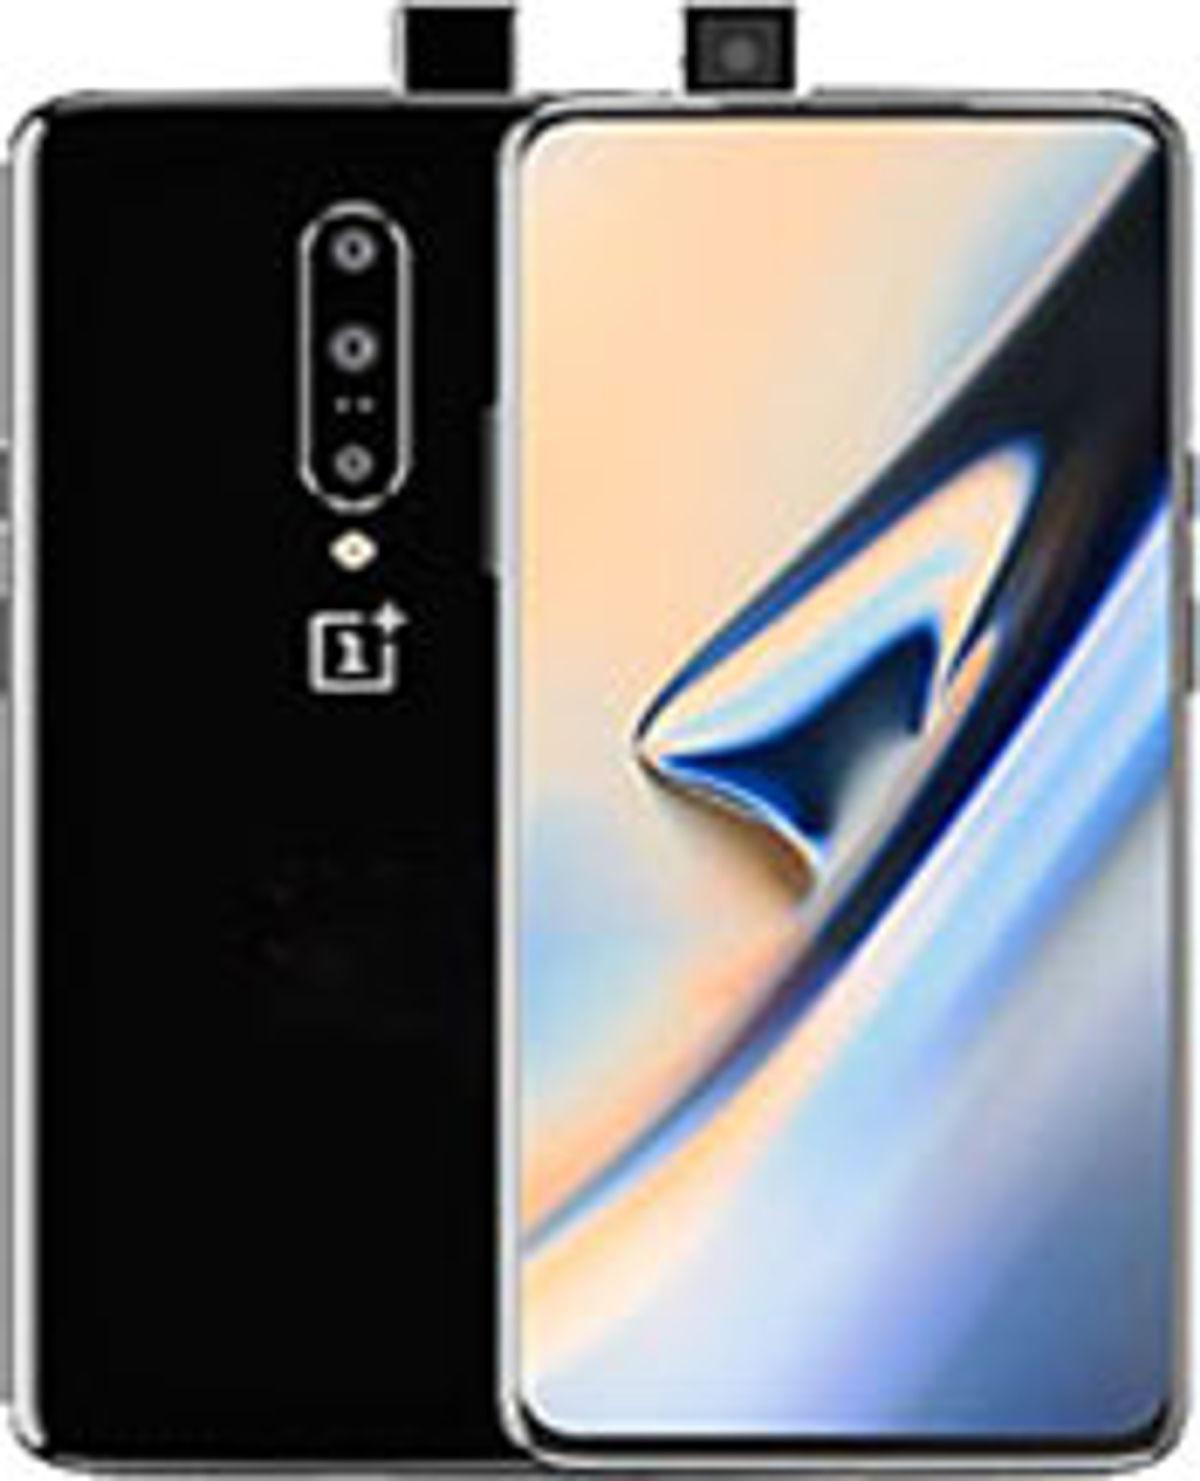 Best Camera Phone In India September 2019 | Digit